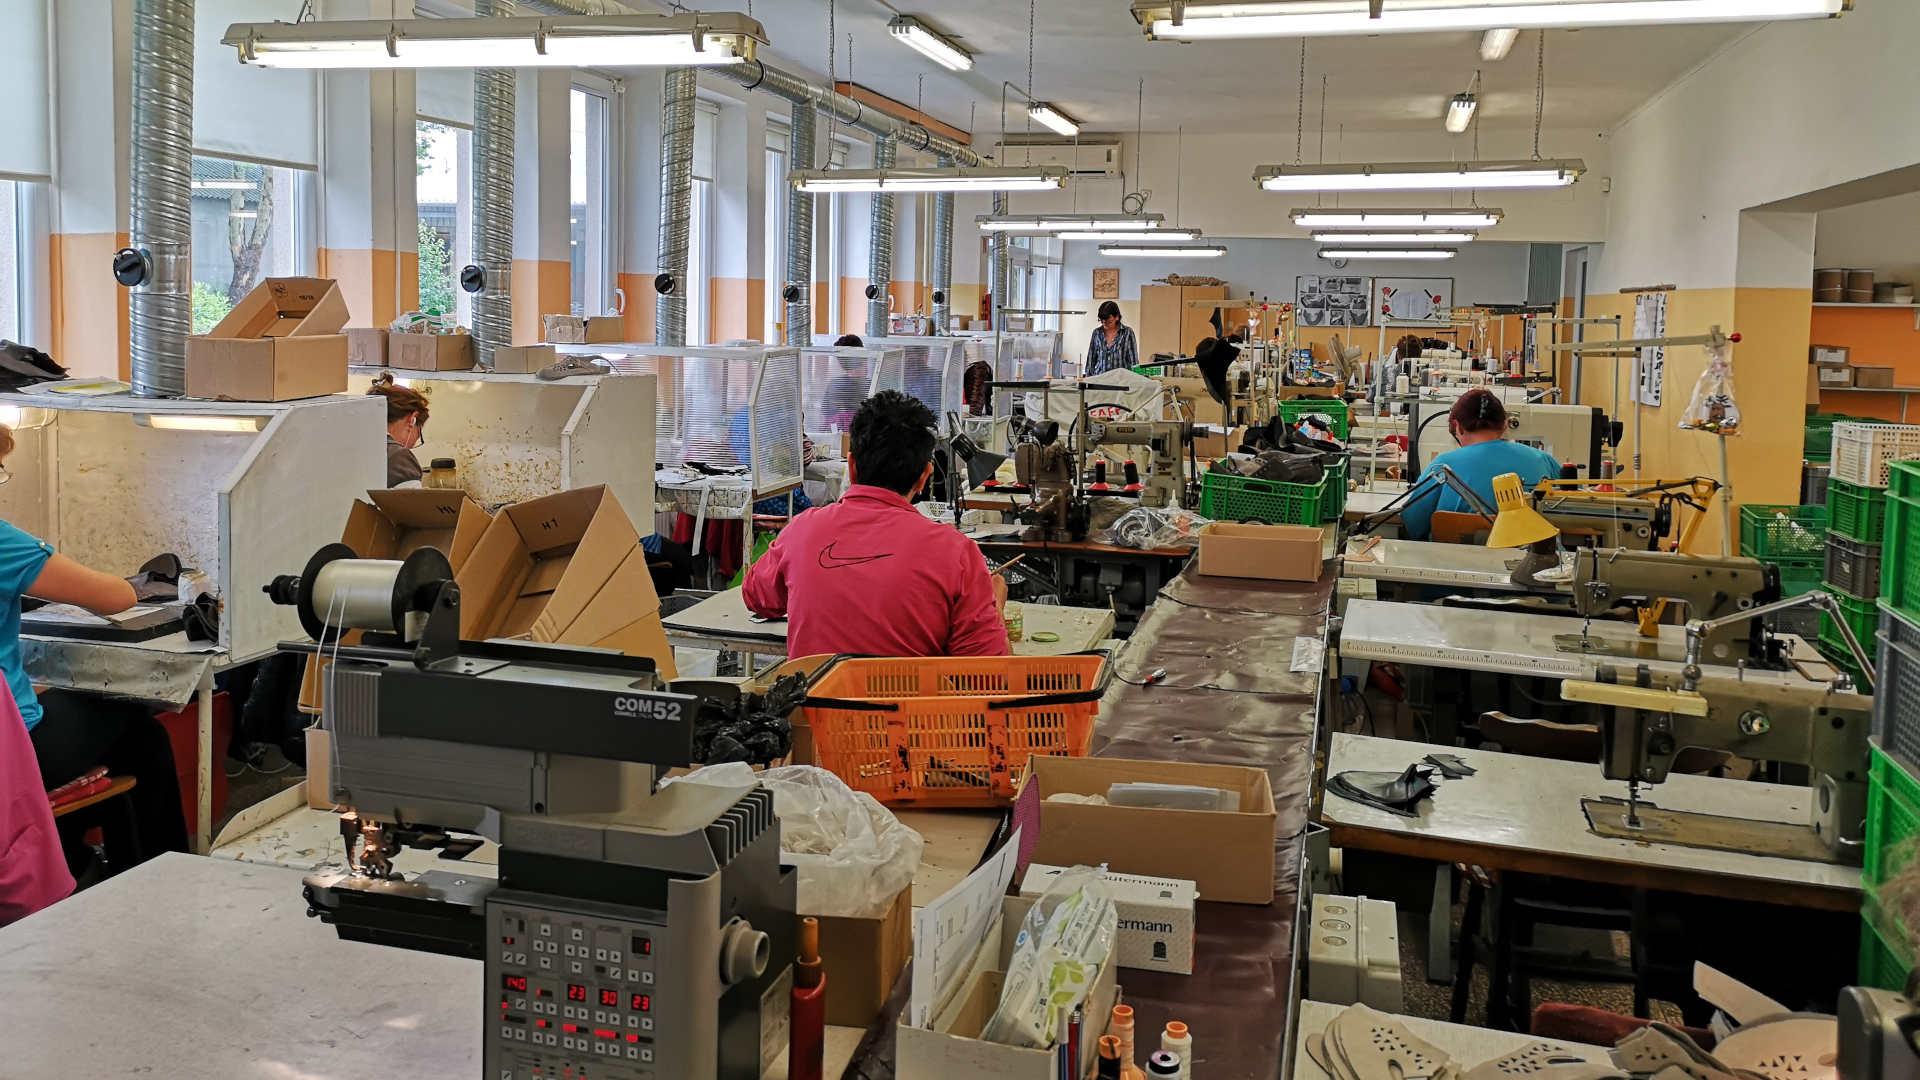 Herstellung von Schuhoberteilen, női cipőfelsőrész